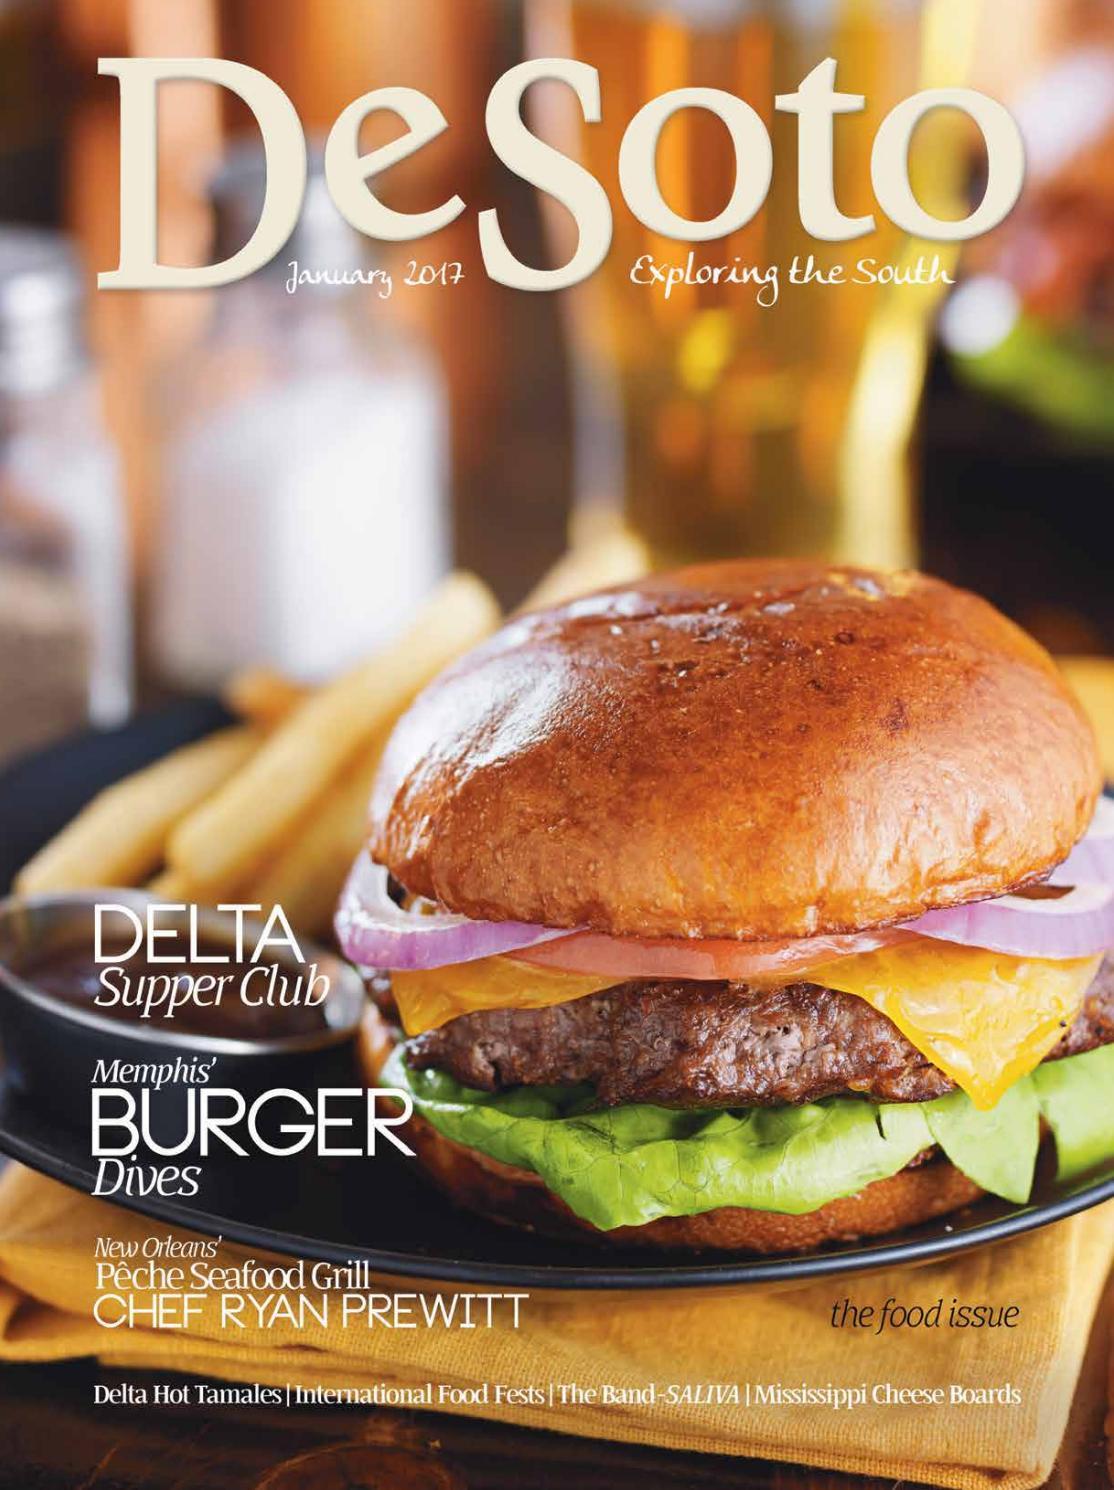 Desoto magazine january 2017 by desoto magazine exploring the south issuu